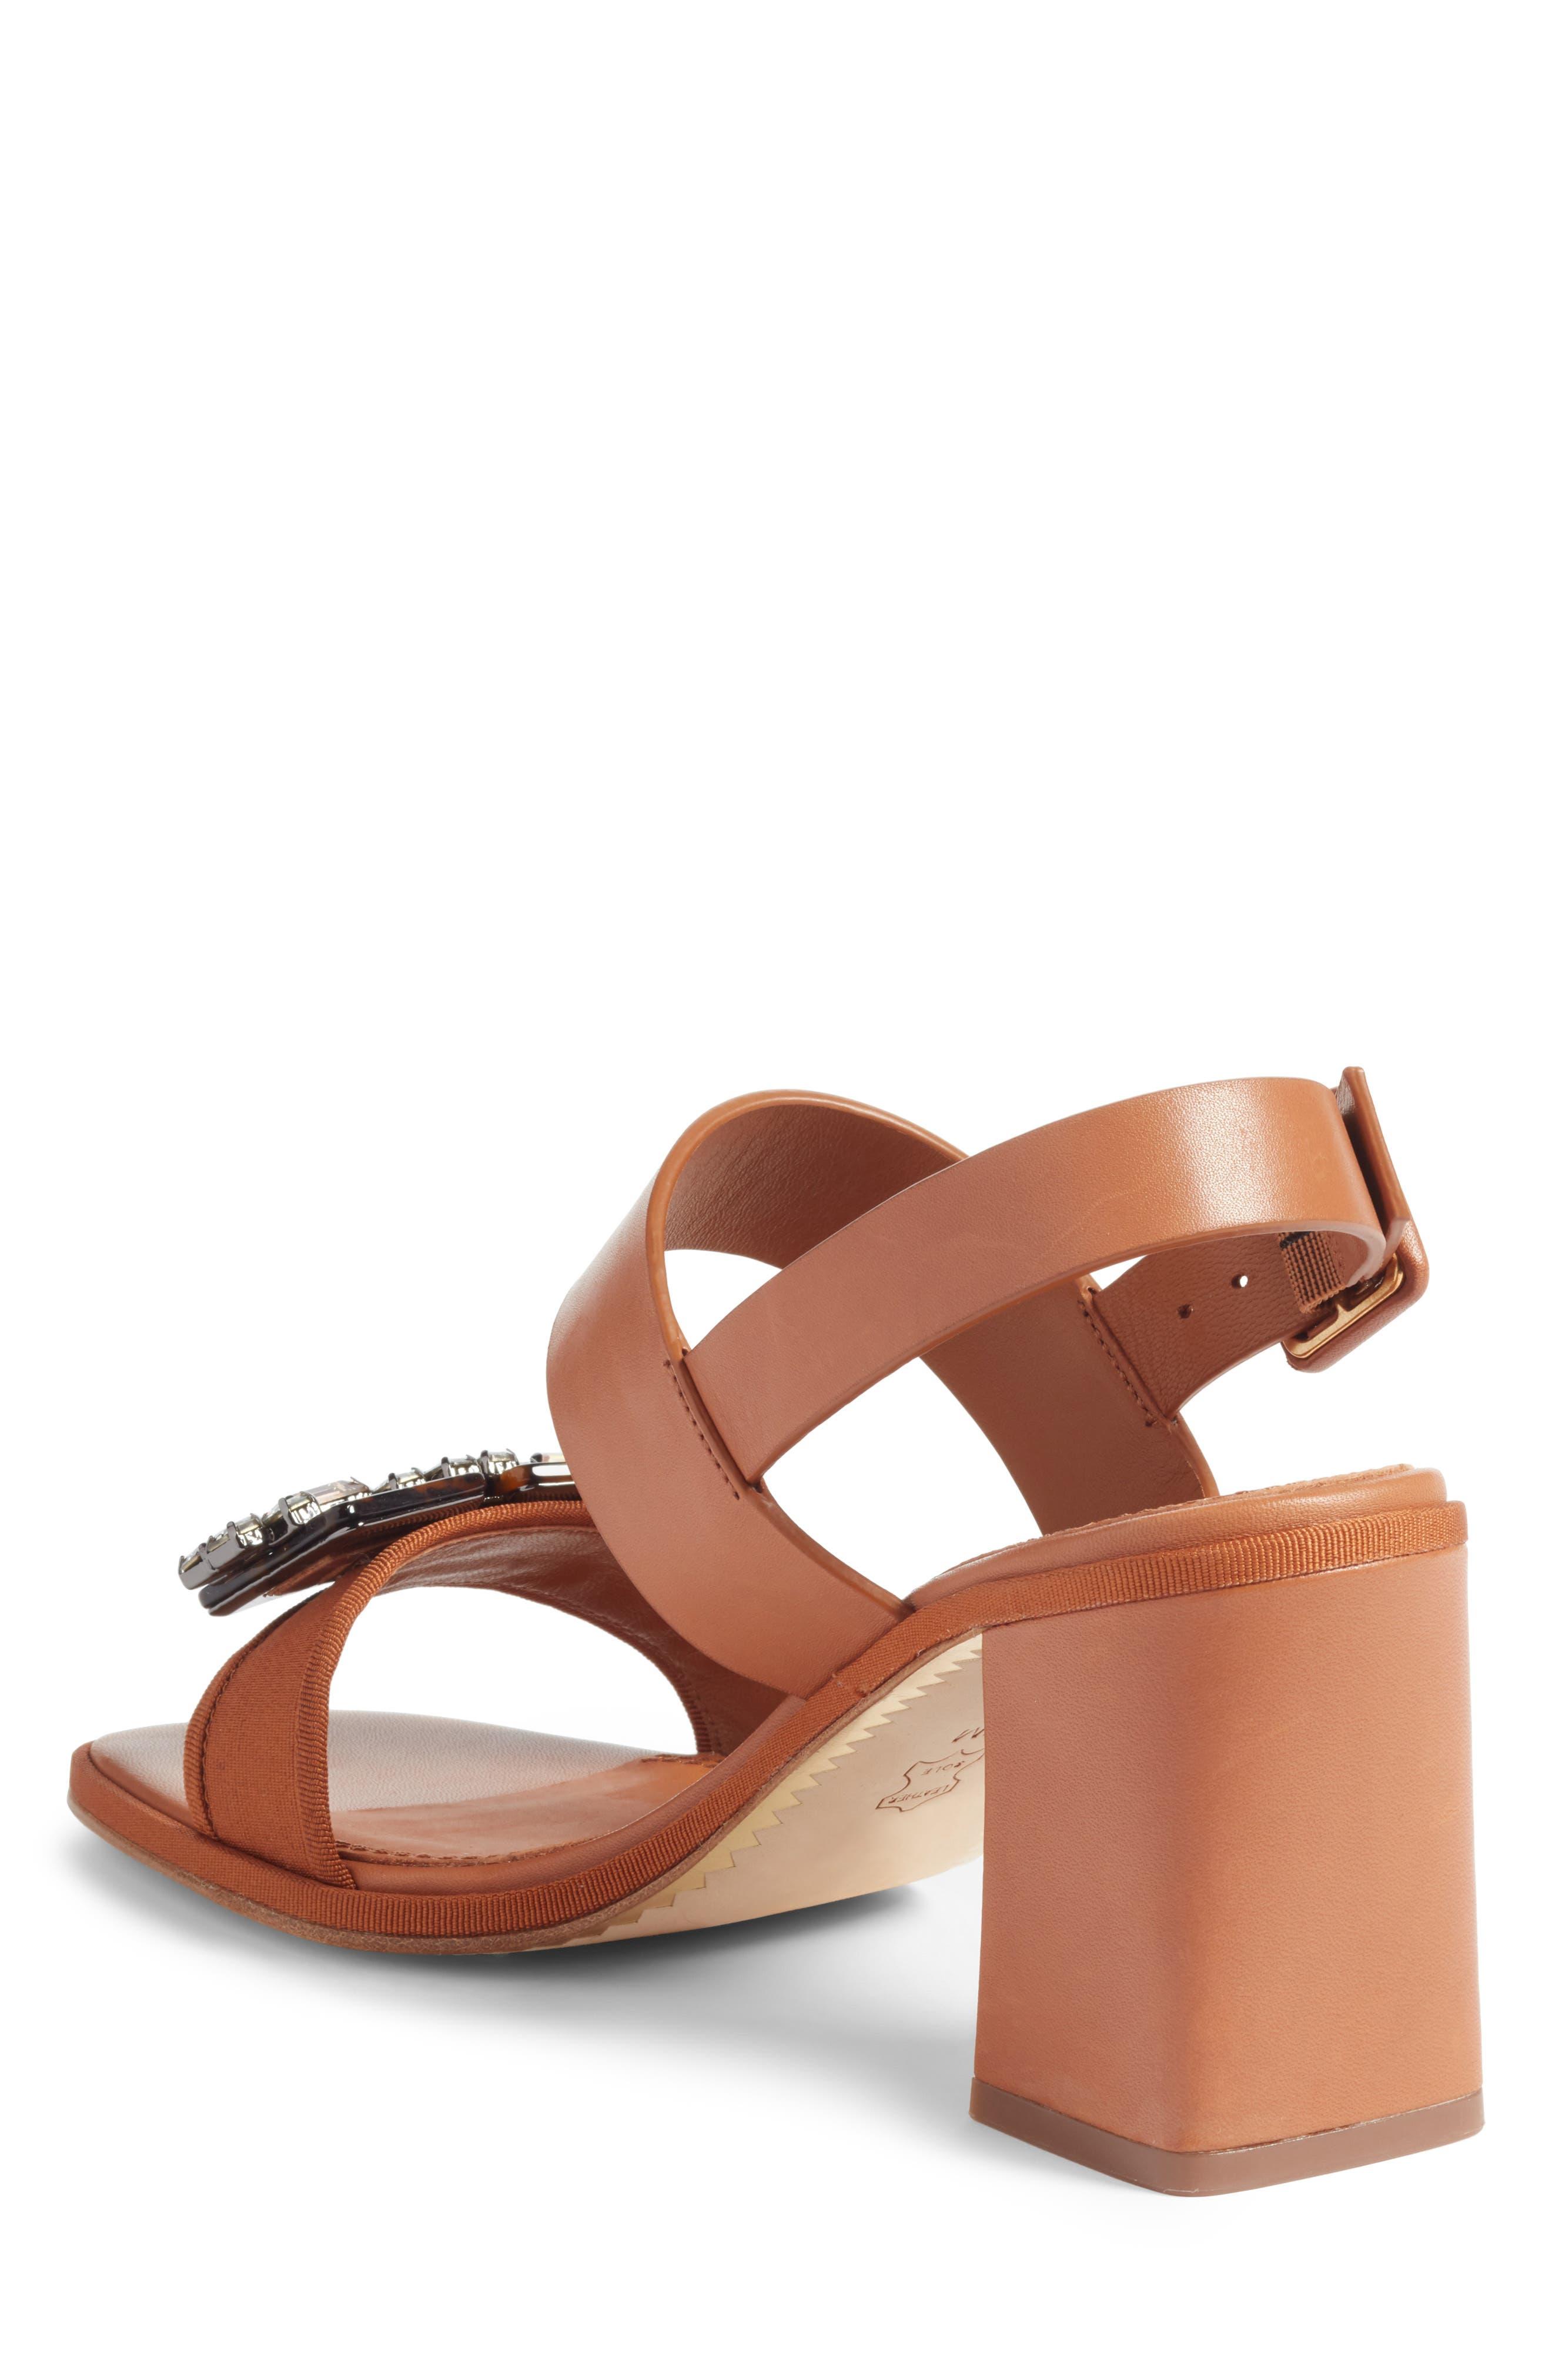 Delaney Embellished Double Strap Sandal,                             Alternate thumbnail 2, color,                             Tan/ Tan